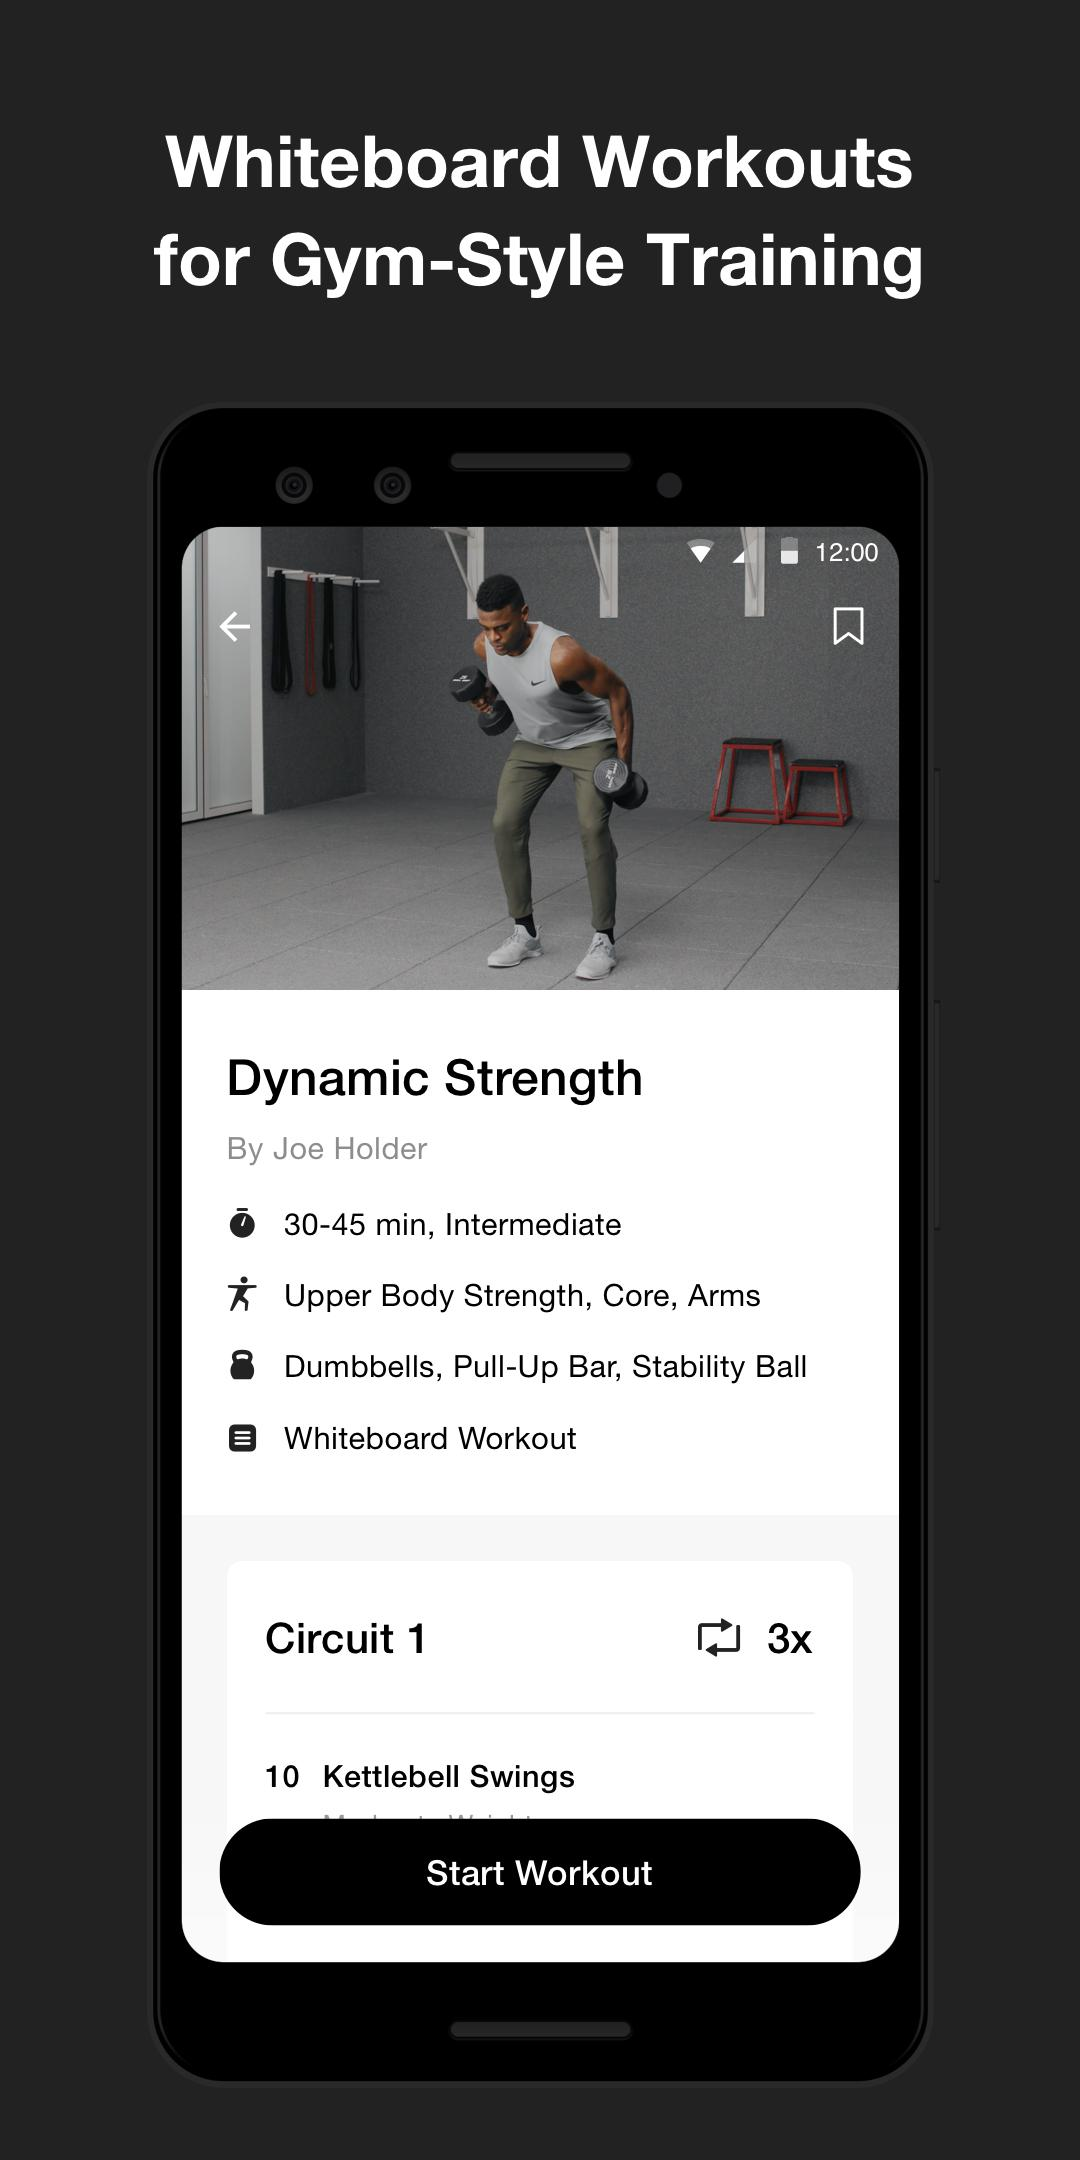 Nike Training Club - Workouts & Fitness Guidance 6.16.0 Screenshot 6